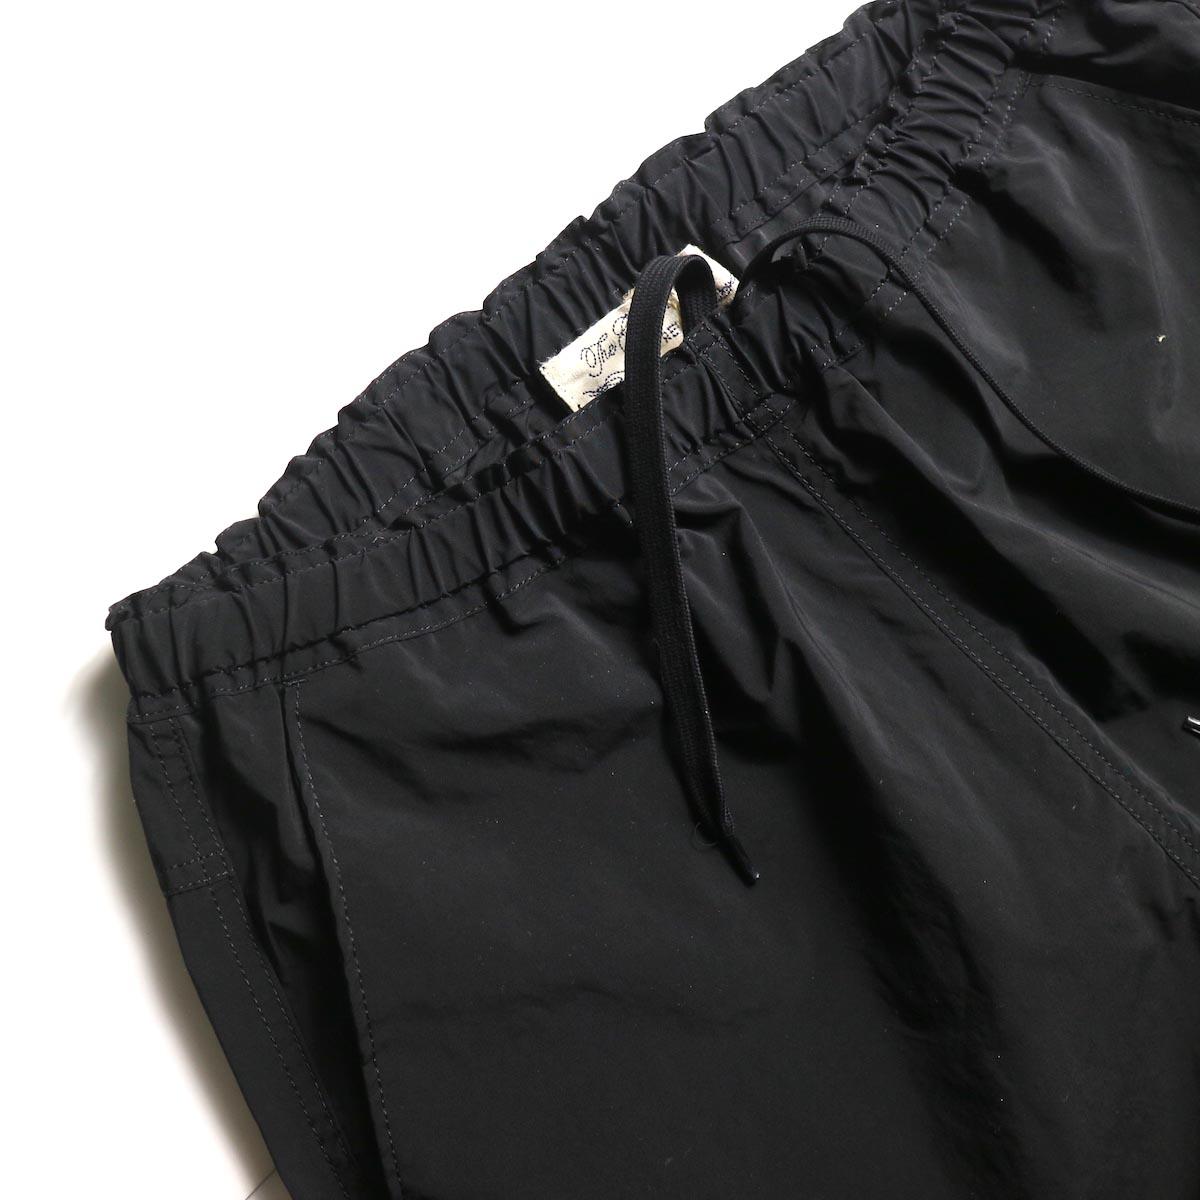 REMI RELIEF × BRIEFING / イージーショーツ (Black)ポケット